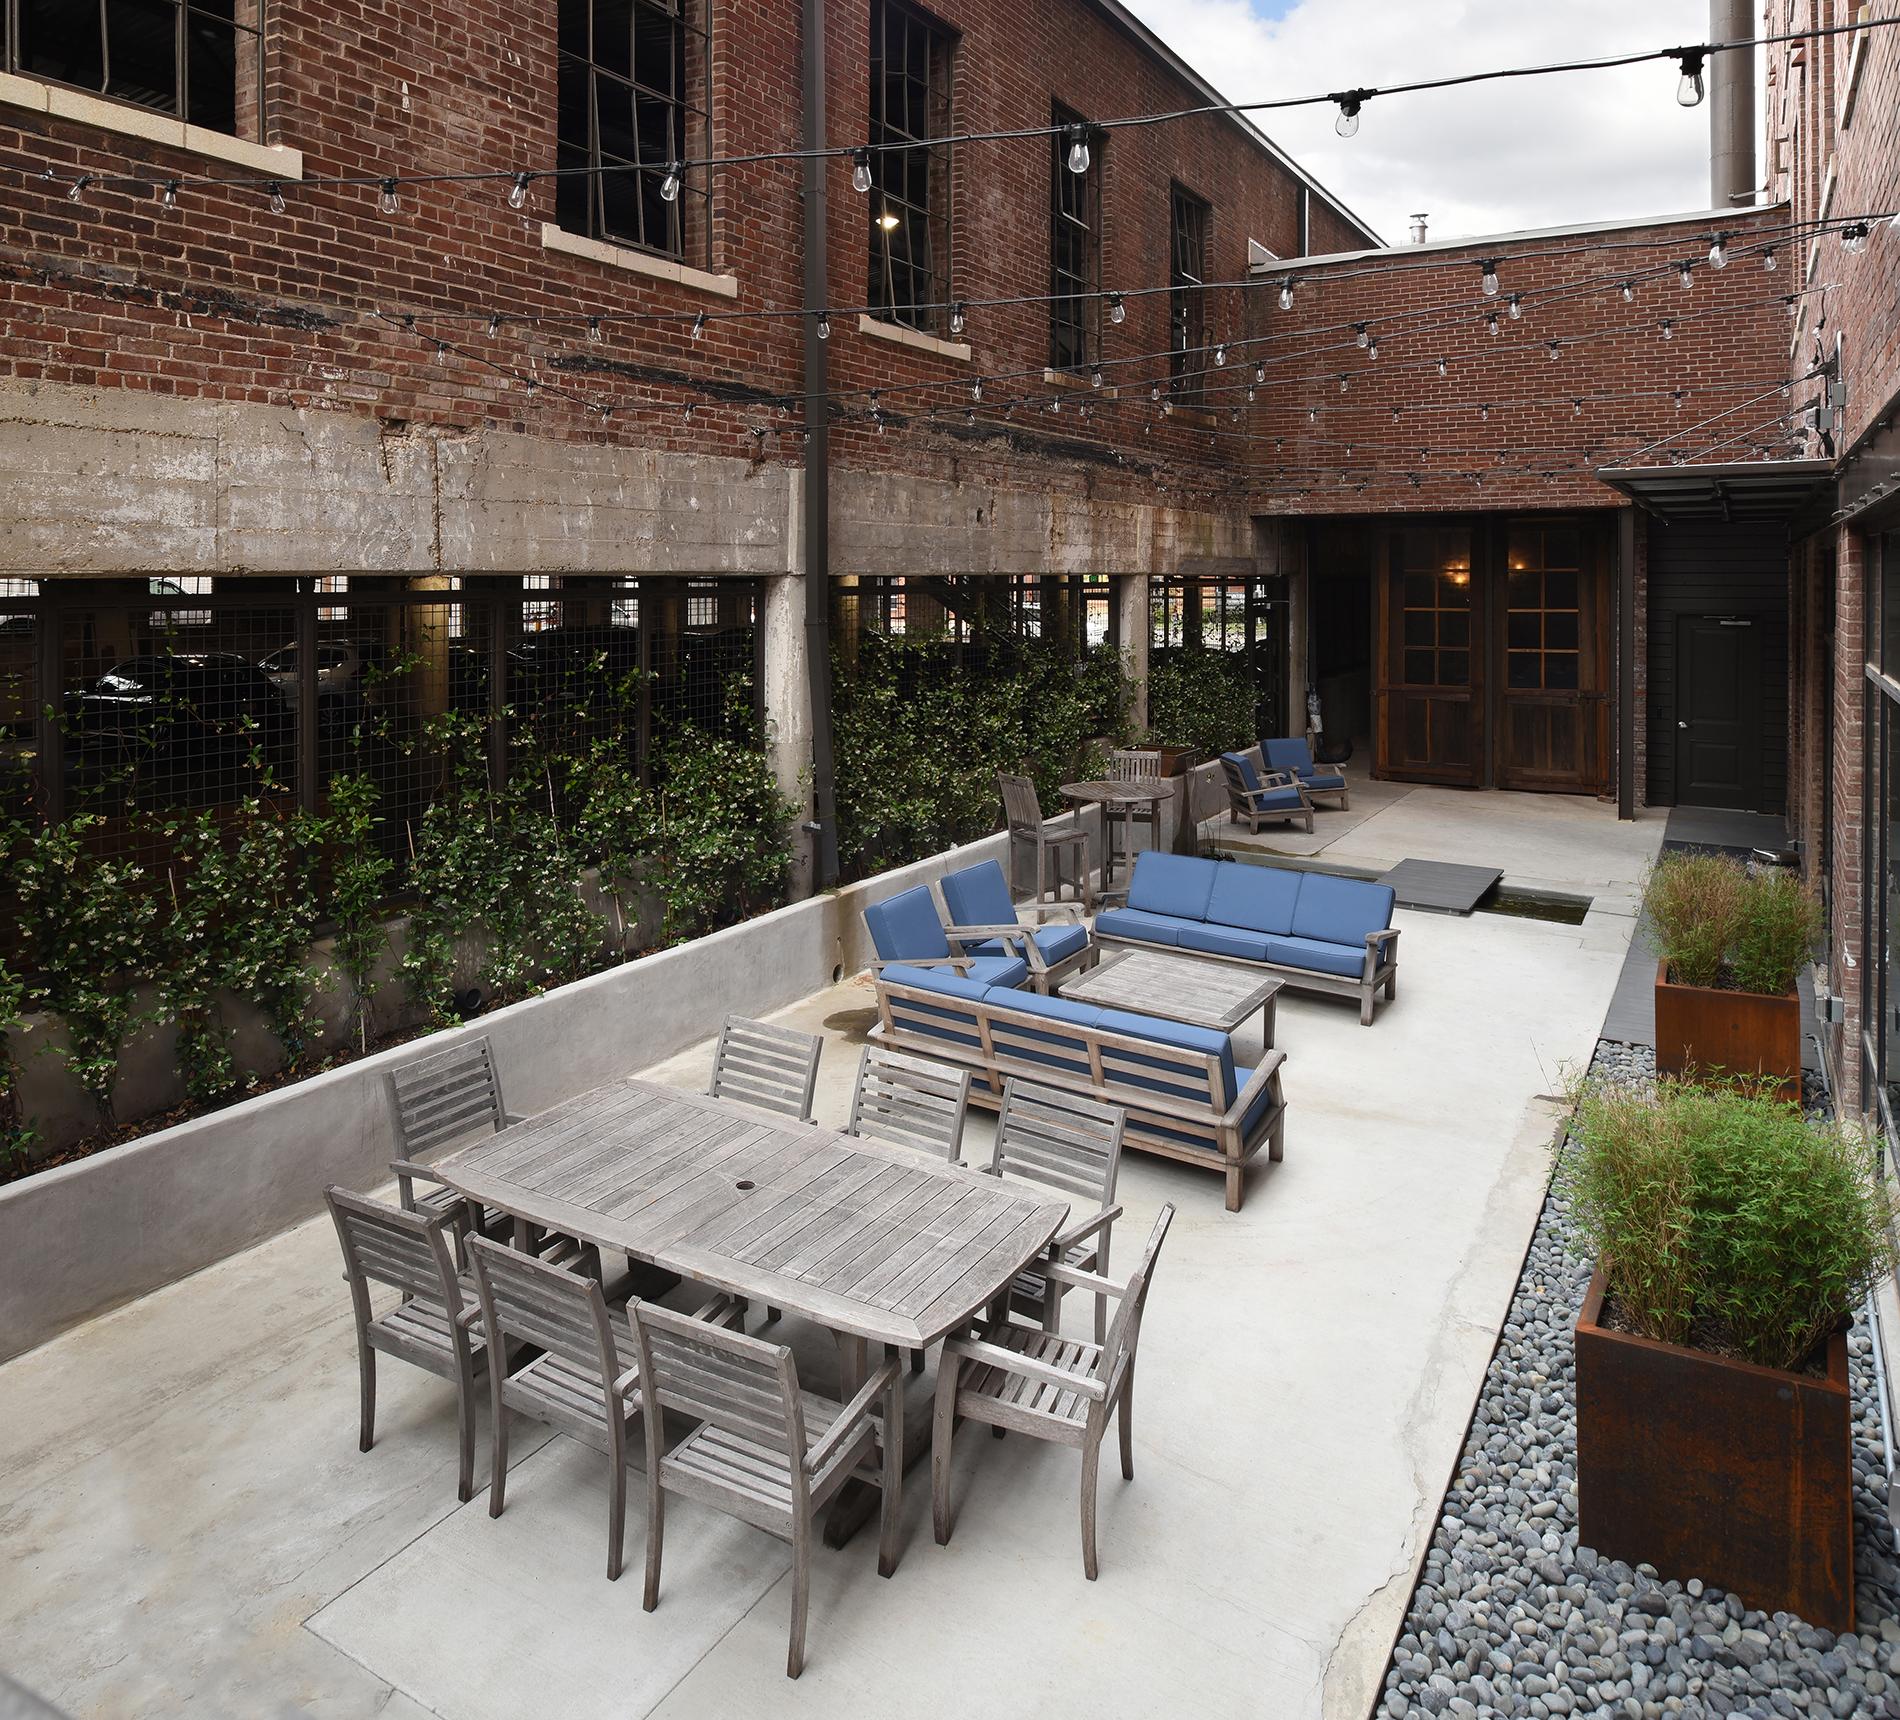 Courtyard_LORES.jpg